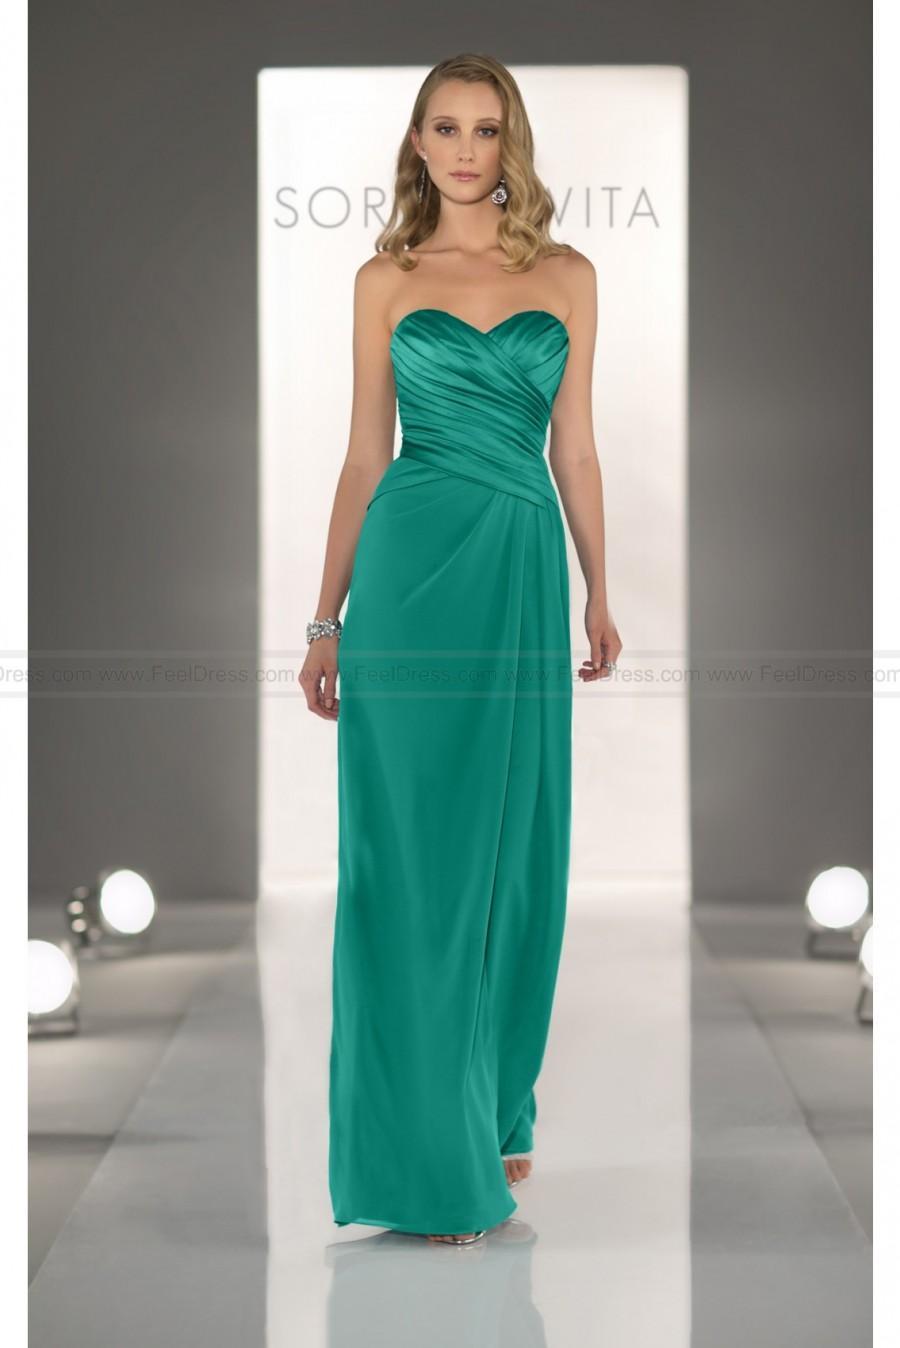 Hochzeit - Sorella Vita Jade Bridesmaid Dress Style 8268